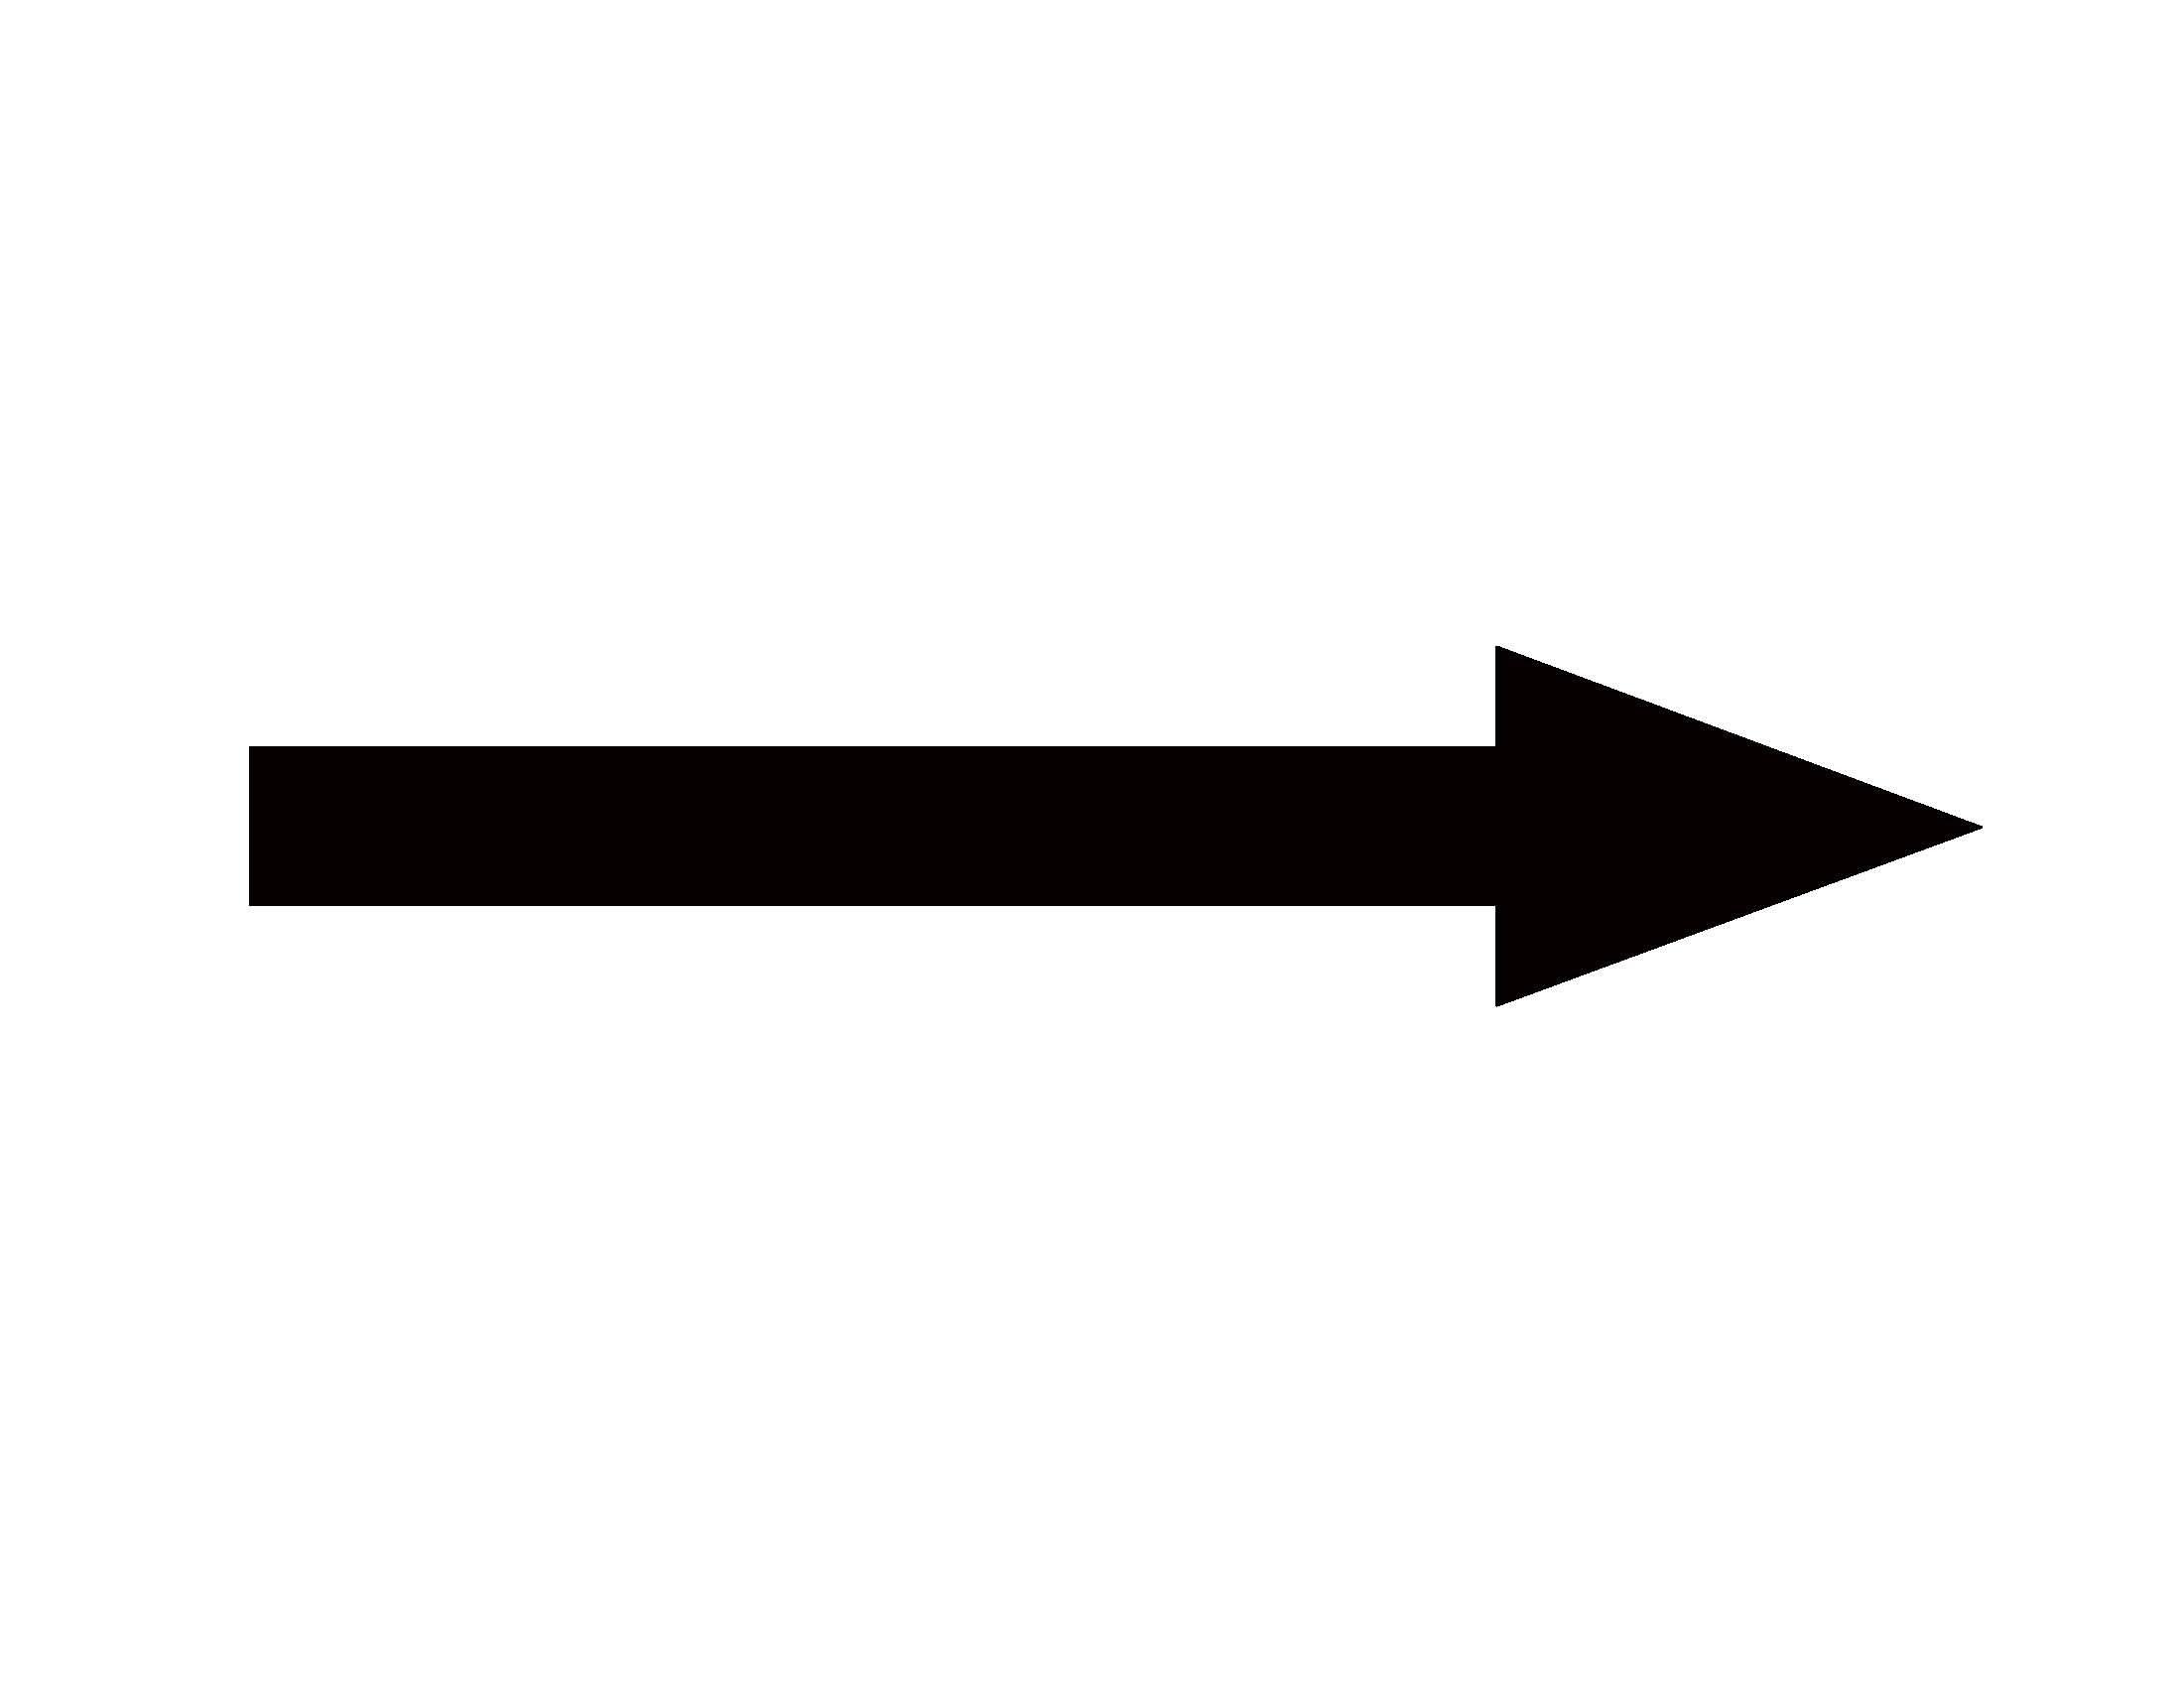 Arrow clipart end, Arrow end Transparent FREE for download.